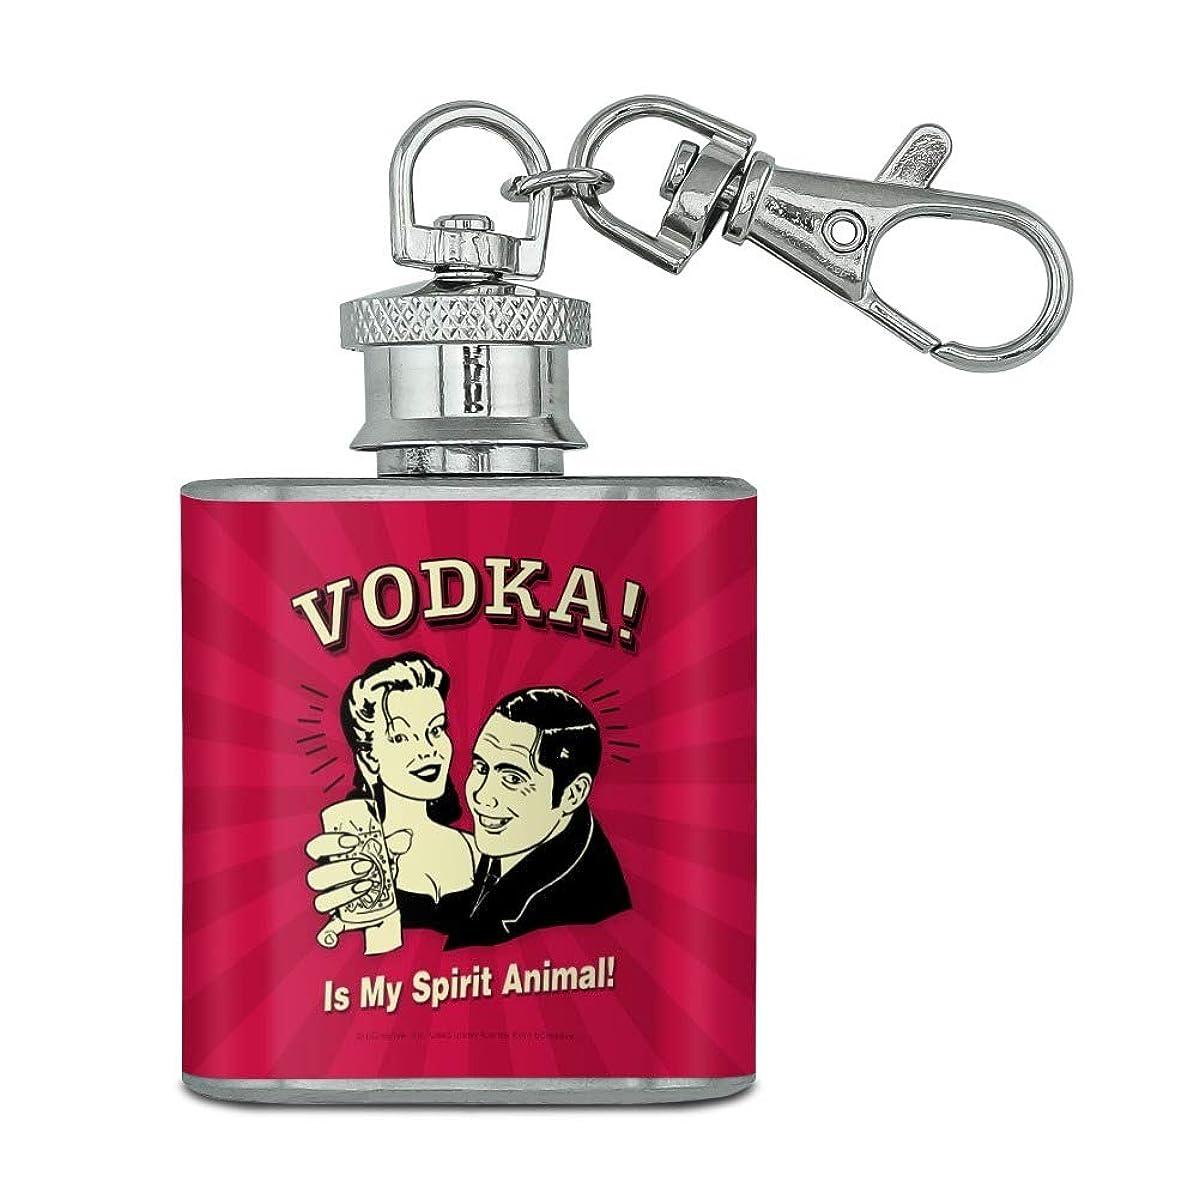 Vodka is My Spirit Animal Funny Humor Stainless Steel 1oz Mini Flask Key Chain